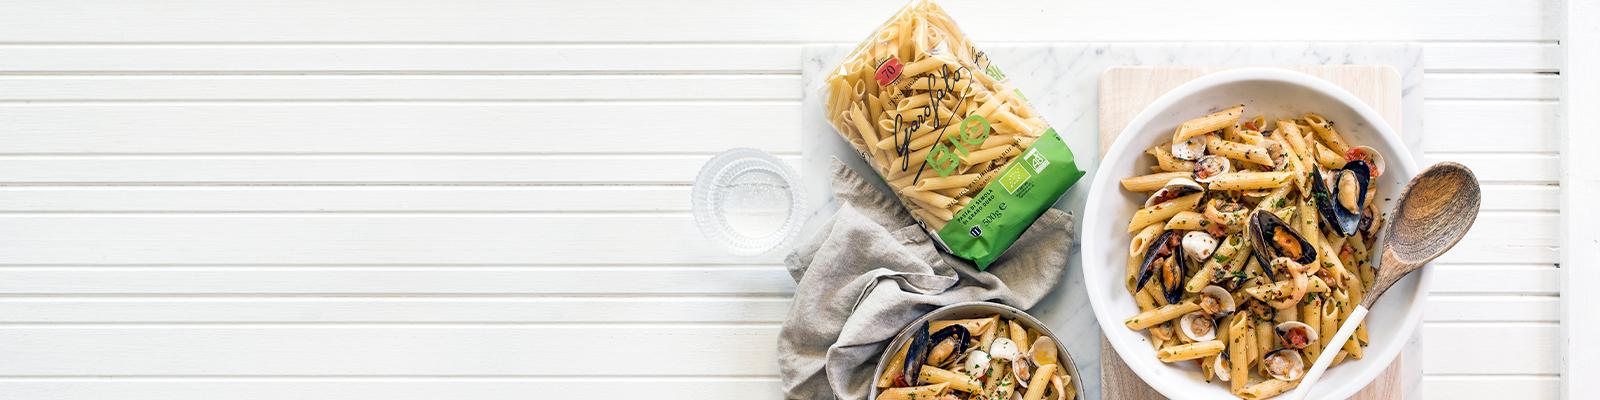 Pasta Garofalo - Pâtes Biologiques